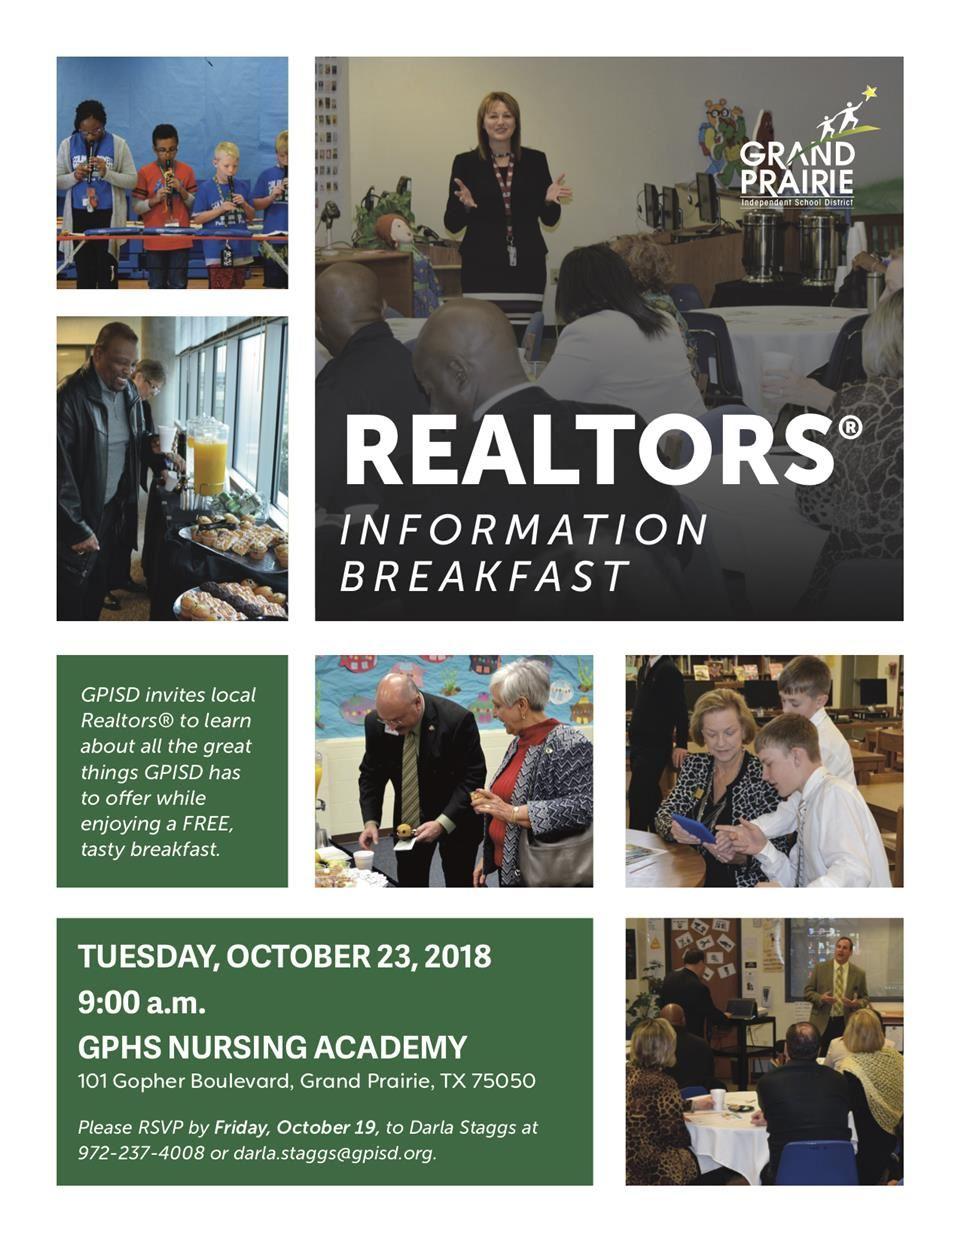 Realtor Information Breakfast Overview